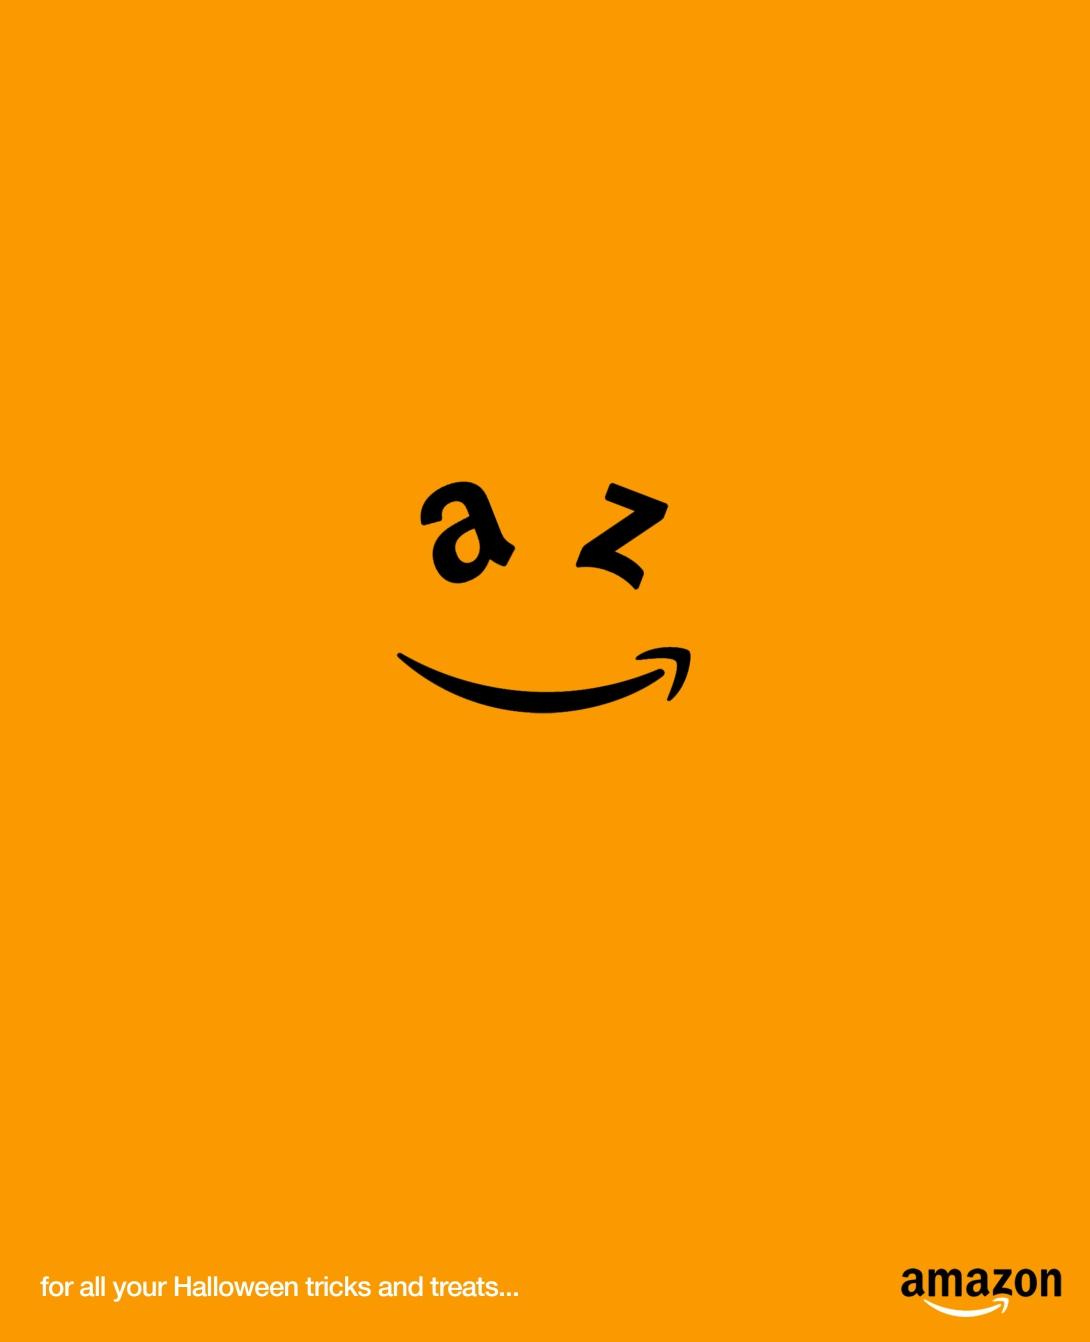 An advertising idea for Amazon at Halloween